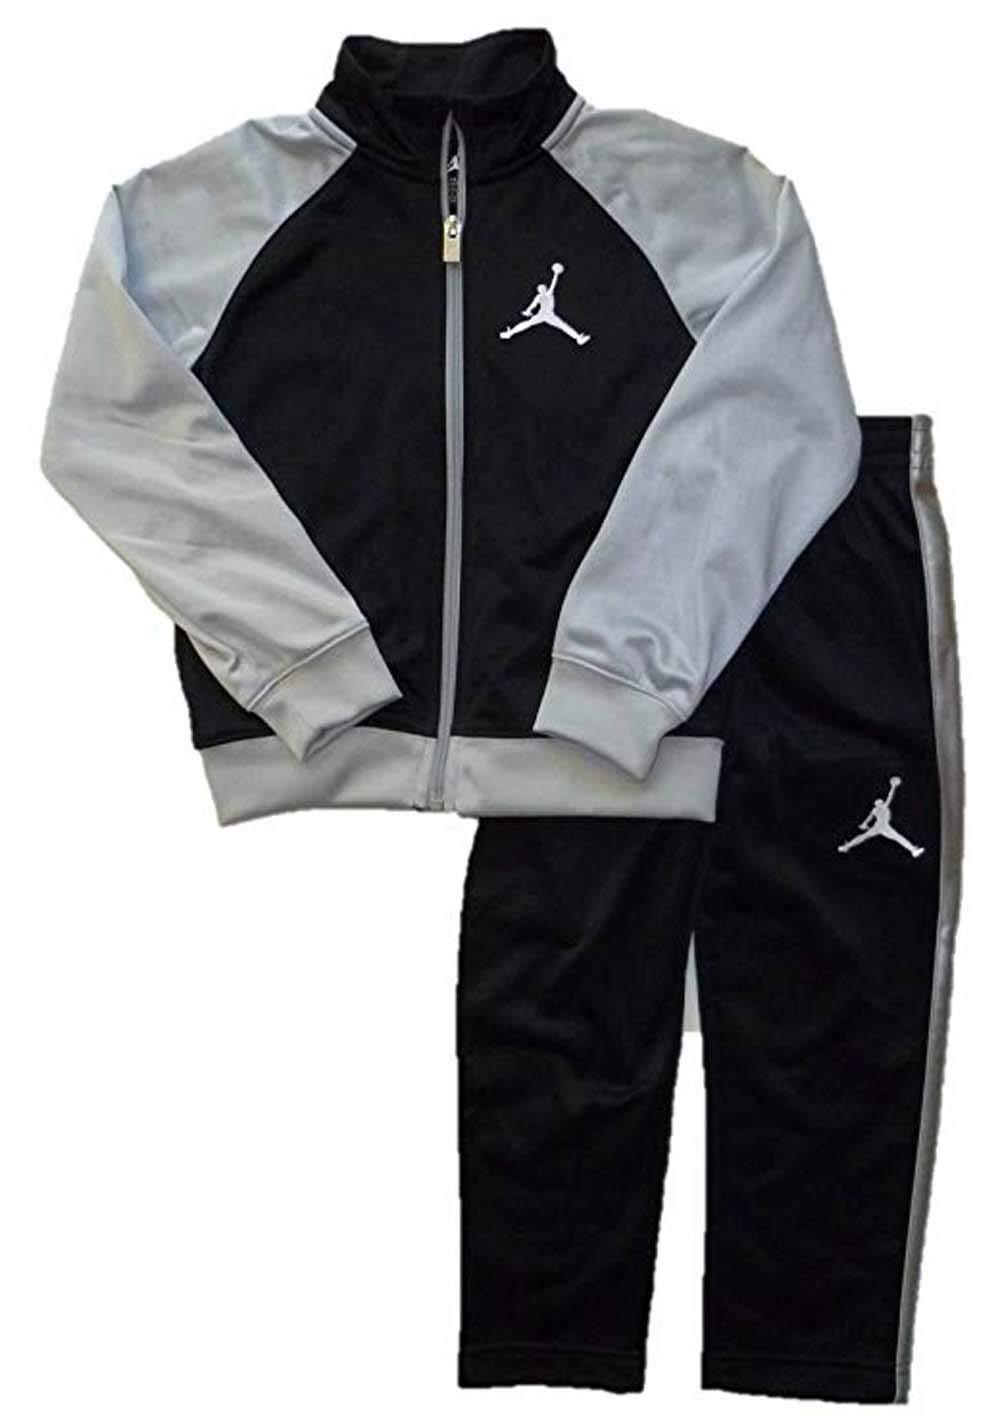 Air Jordan Little Boys Jumpman Zip-up Athletic Jacket and Pants Set (4)